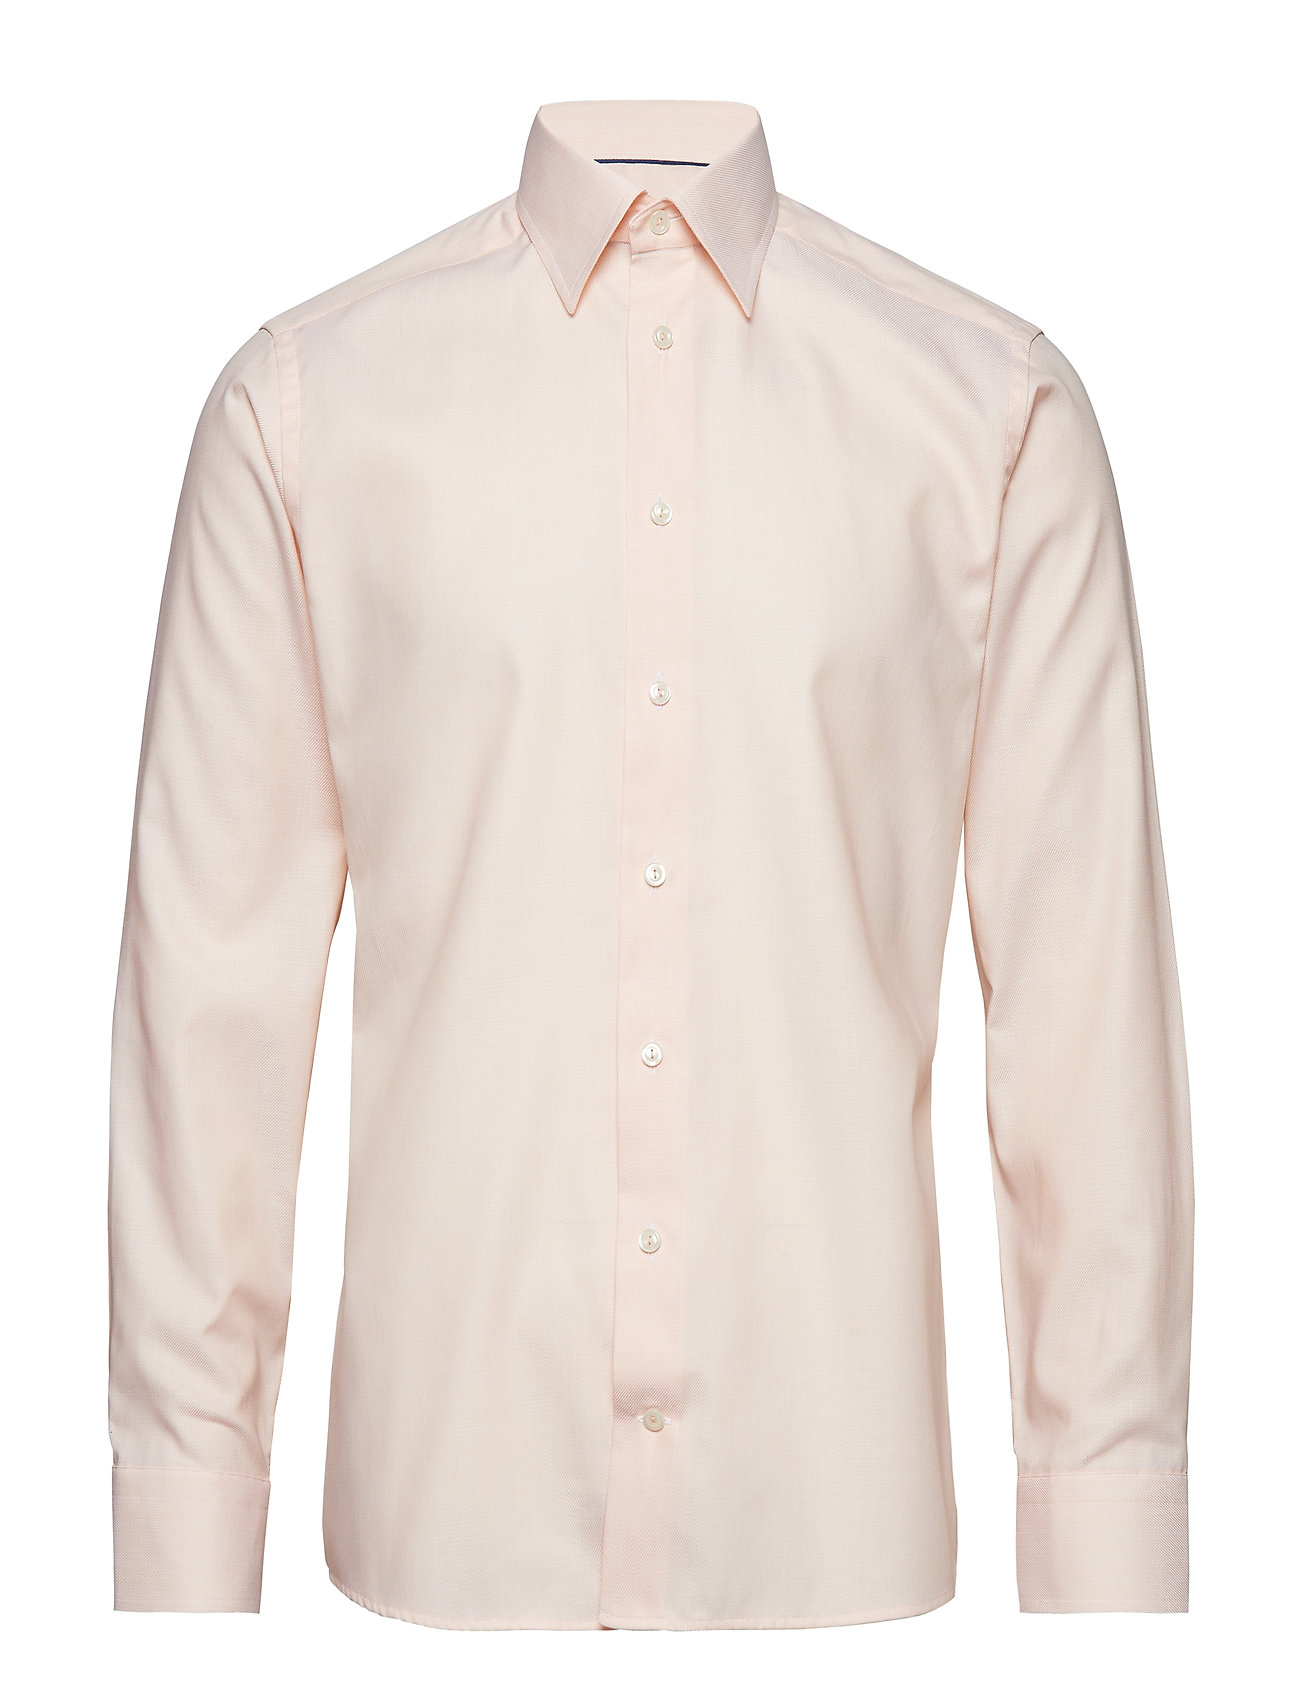 Eton Orange Royal Dobby Shirt - YELLOW/ORANGE